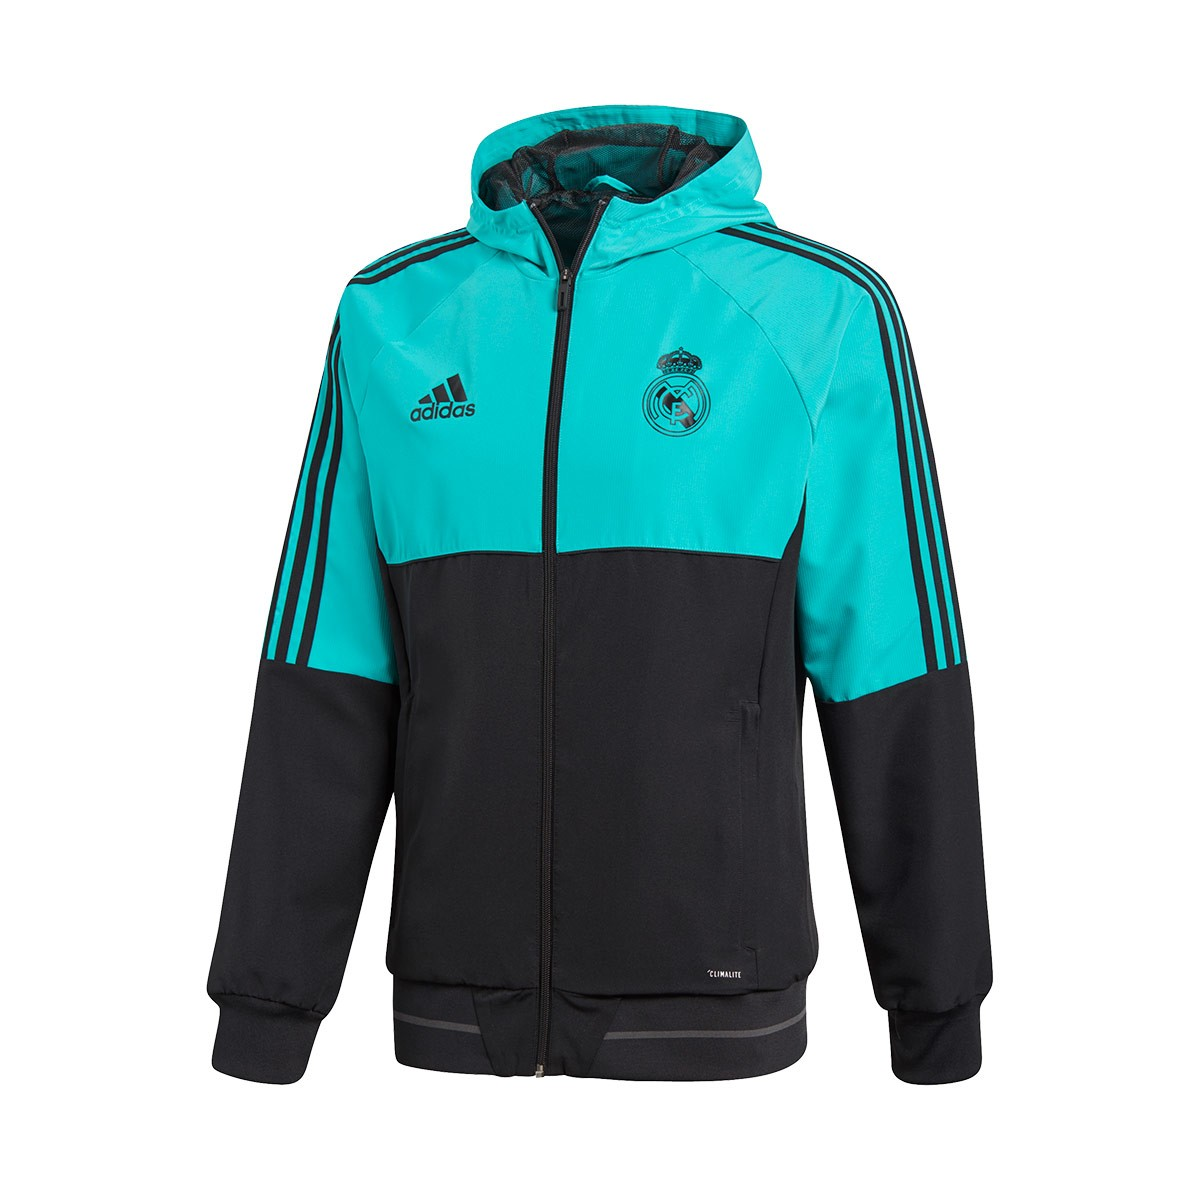 17cb6c901f5fb Jacket adidas Pre Match Real Madrid 2017-2018 Aero reef - Football ...